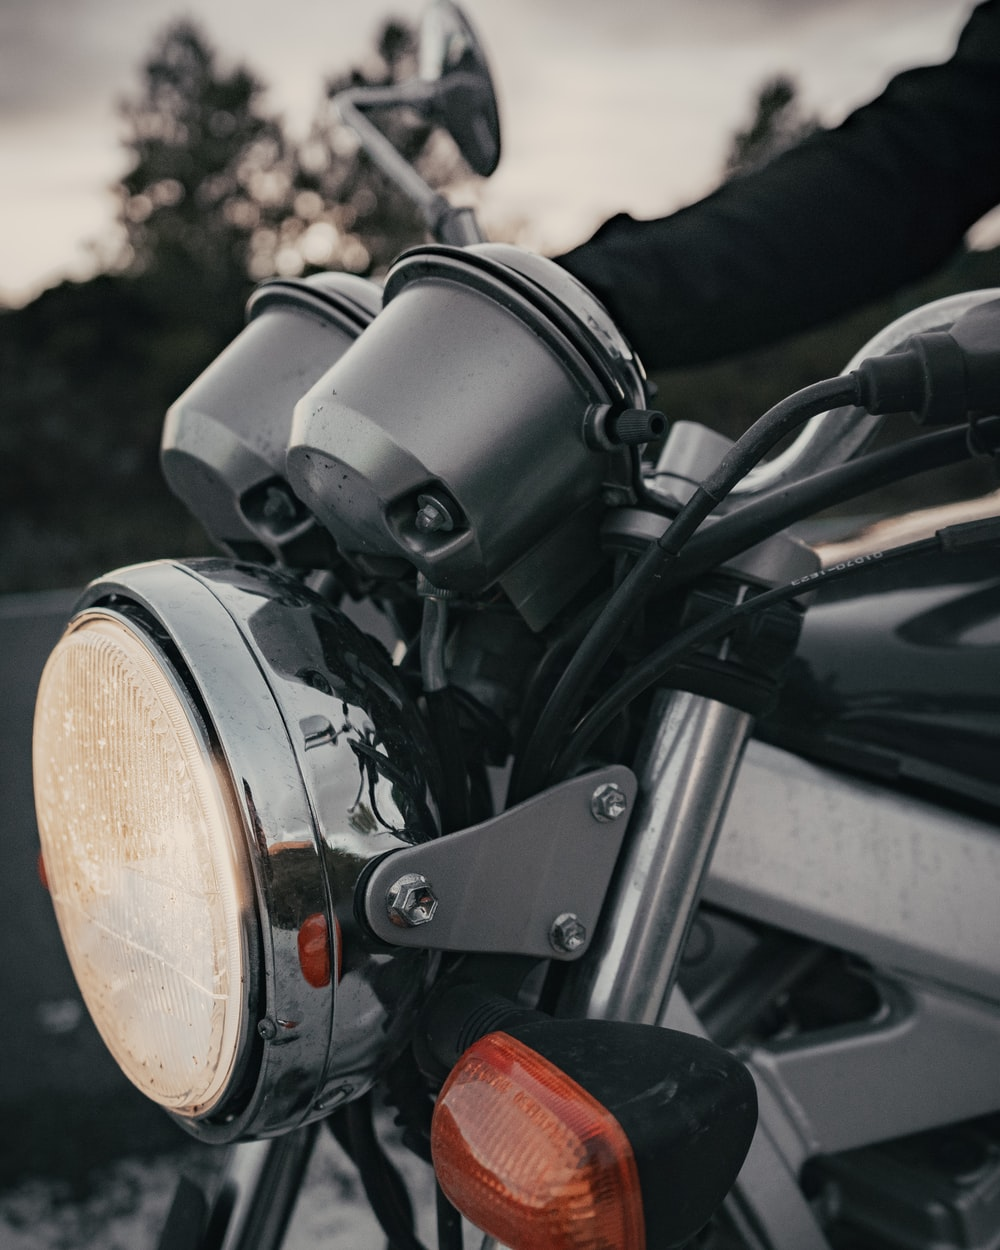 closeup photography of motorcycle headlight